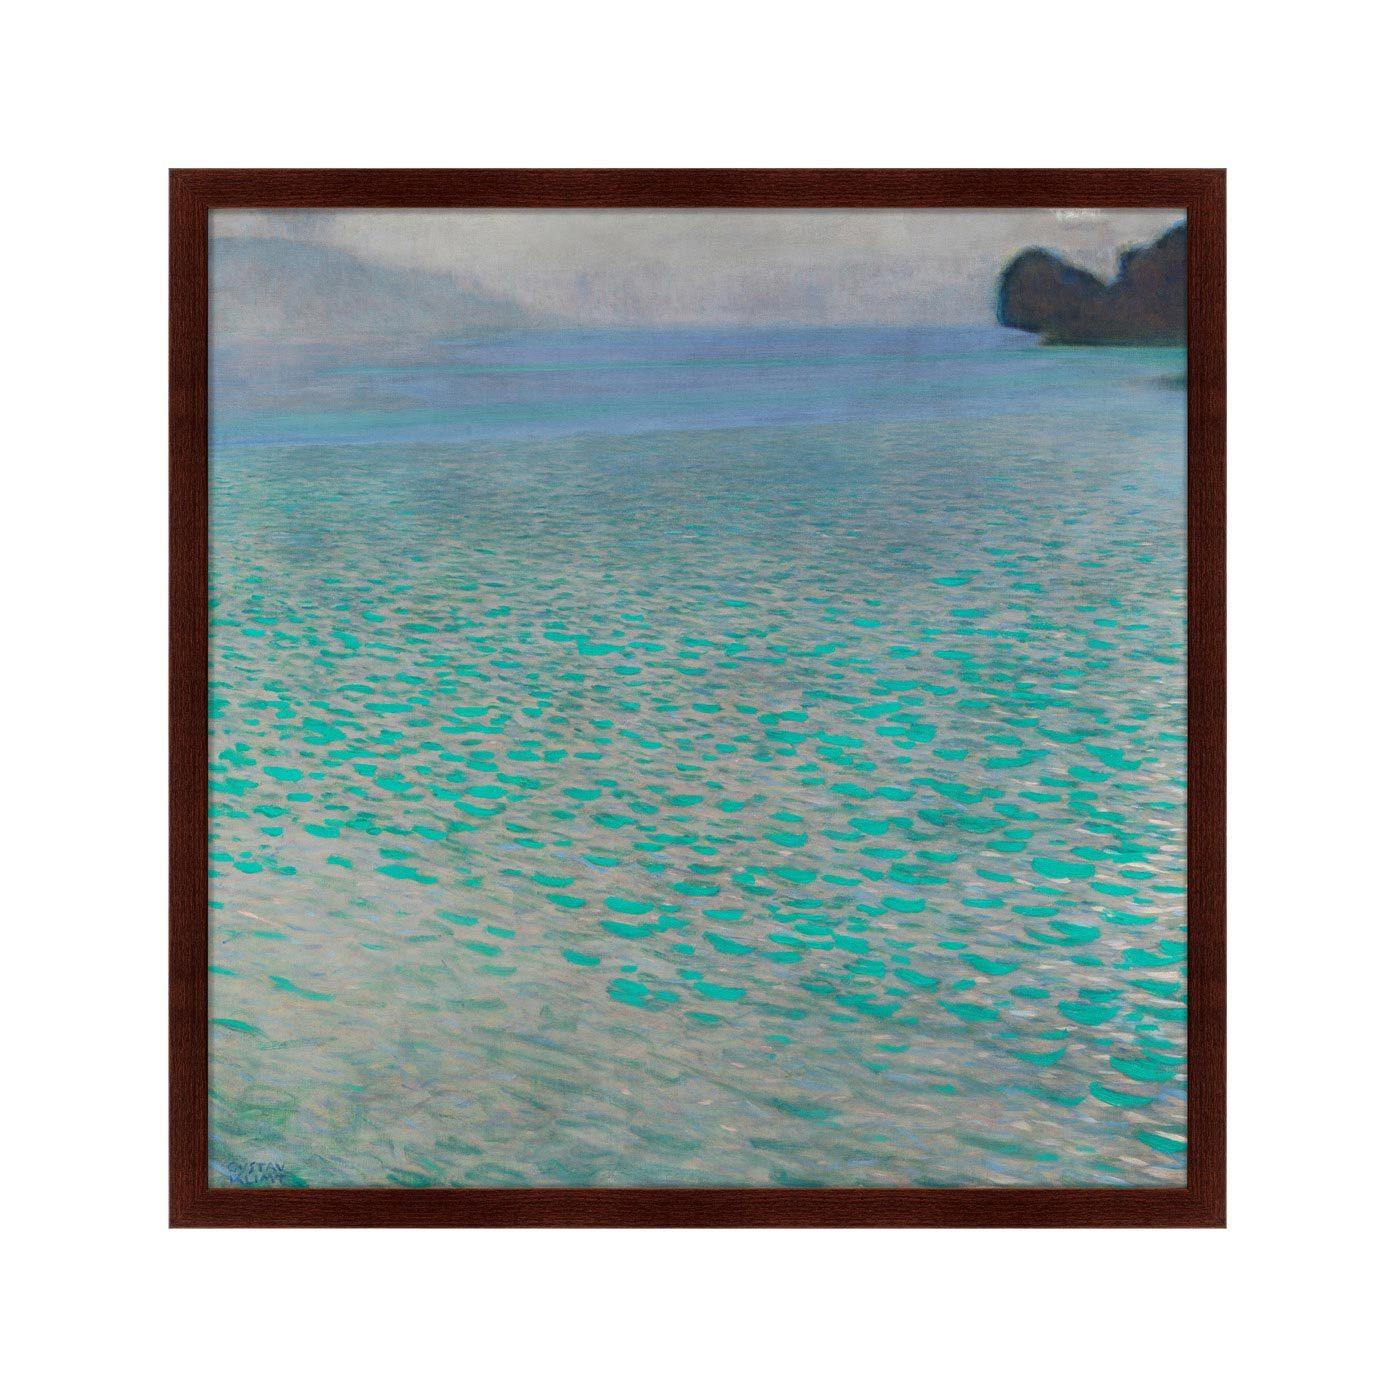 {} Картины в Квартиру Картина Attersee (79х79 см) картины в квартиру картина слон 79х100 см